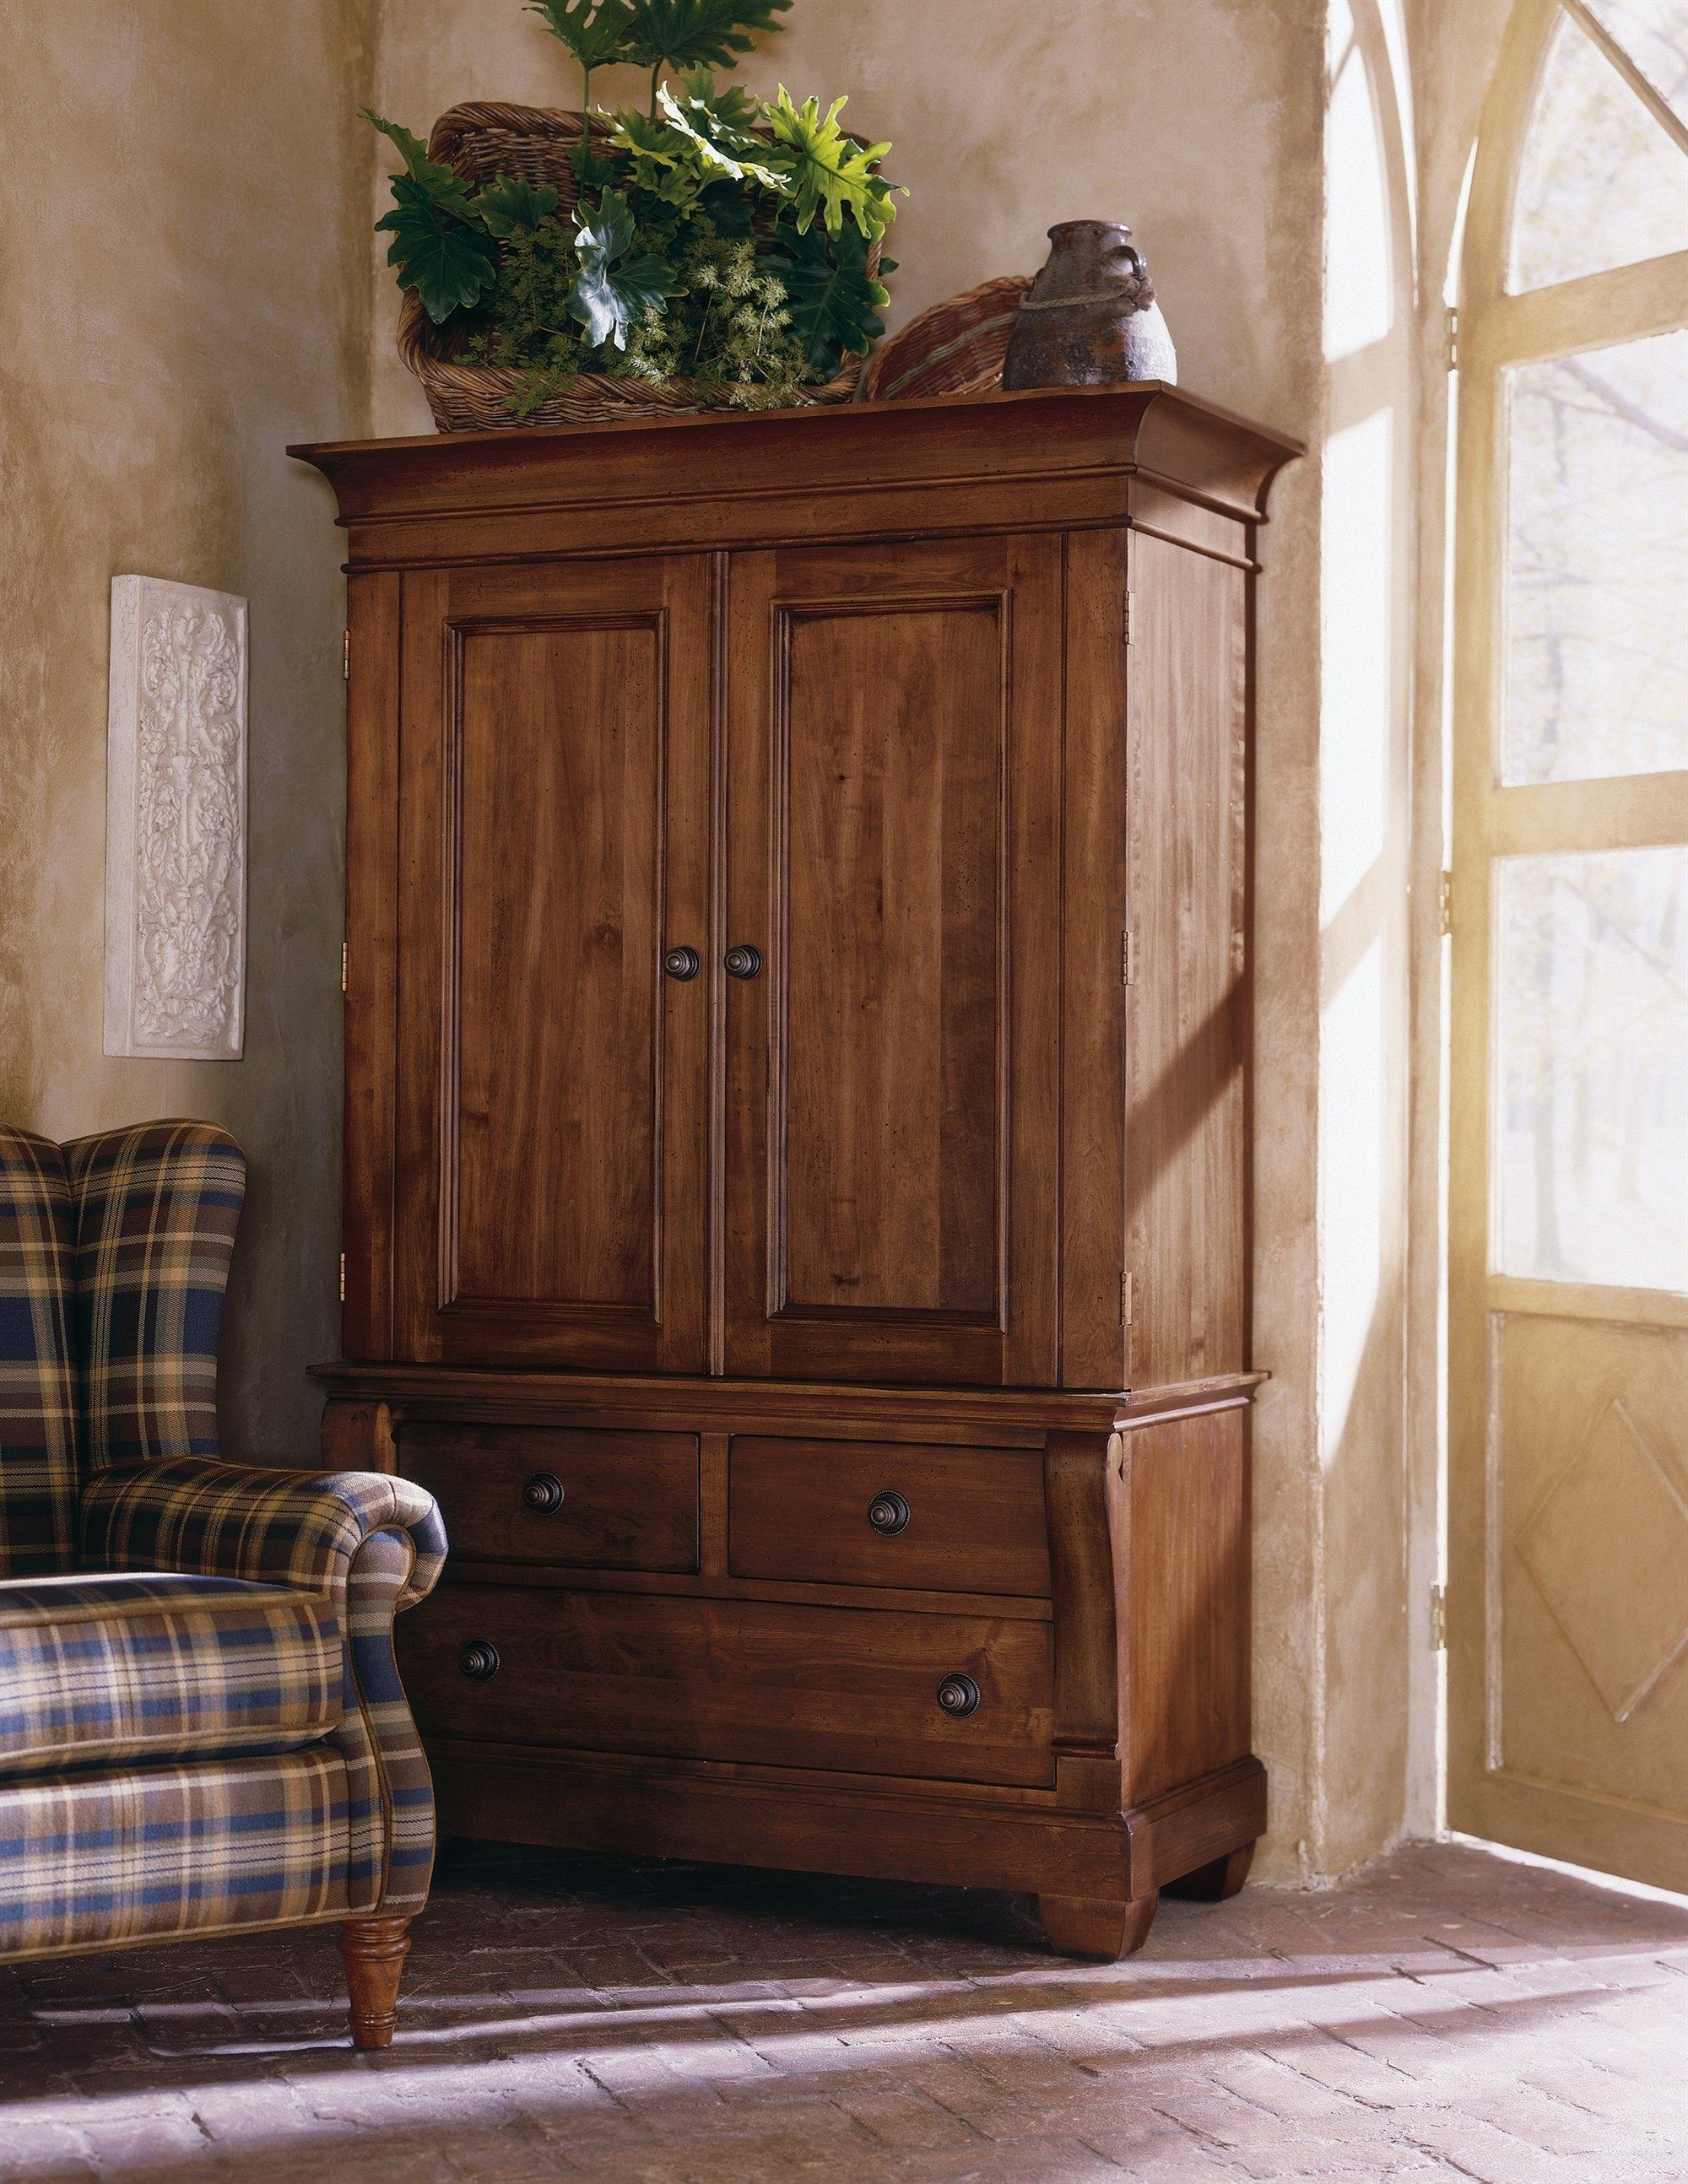 Wicker Armoire Wardrobes Regarding Latest Bedroom: Antique Interior Storage Design With Wardrobe Armoire (View 5 of 15)